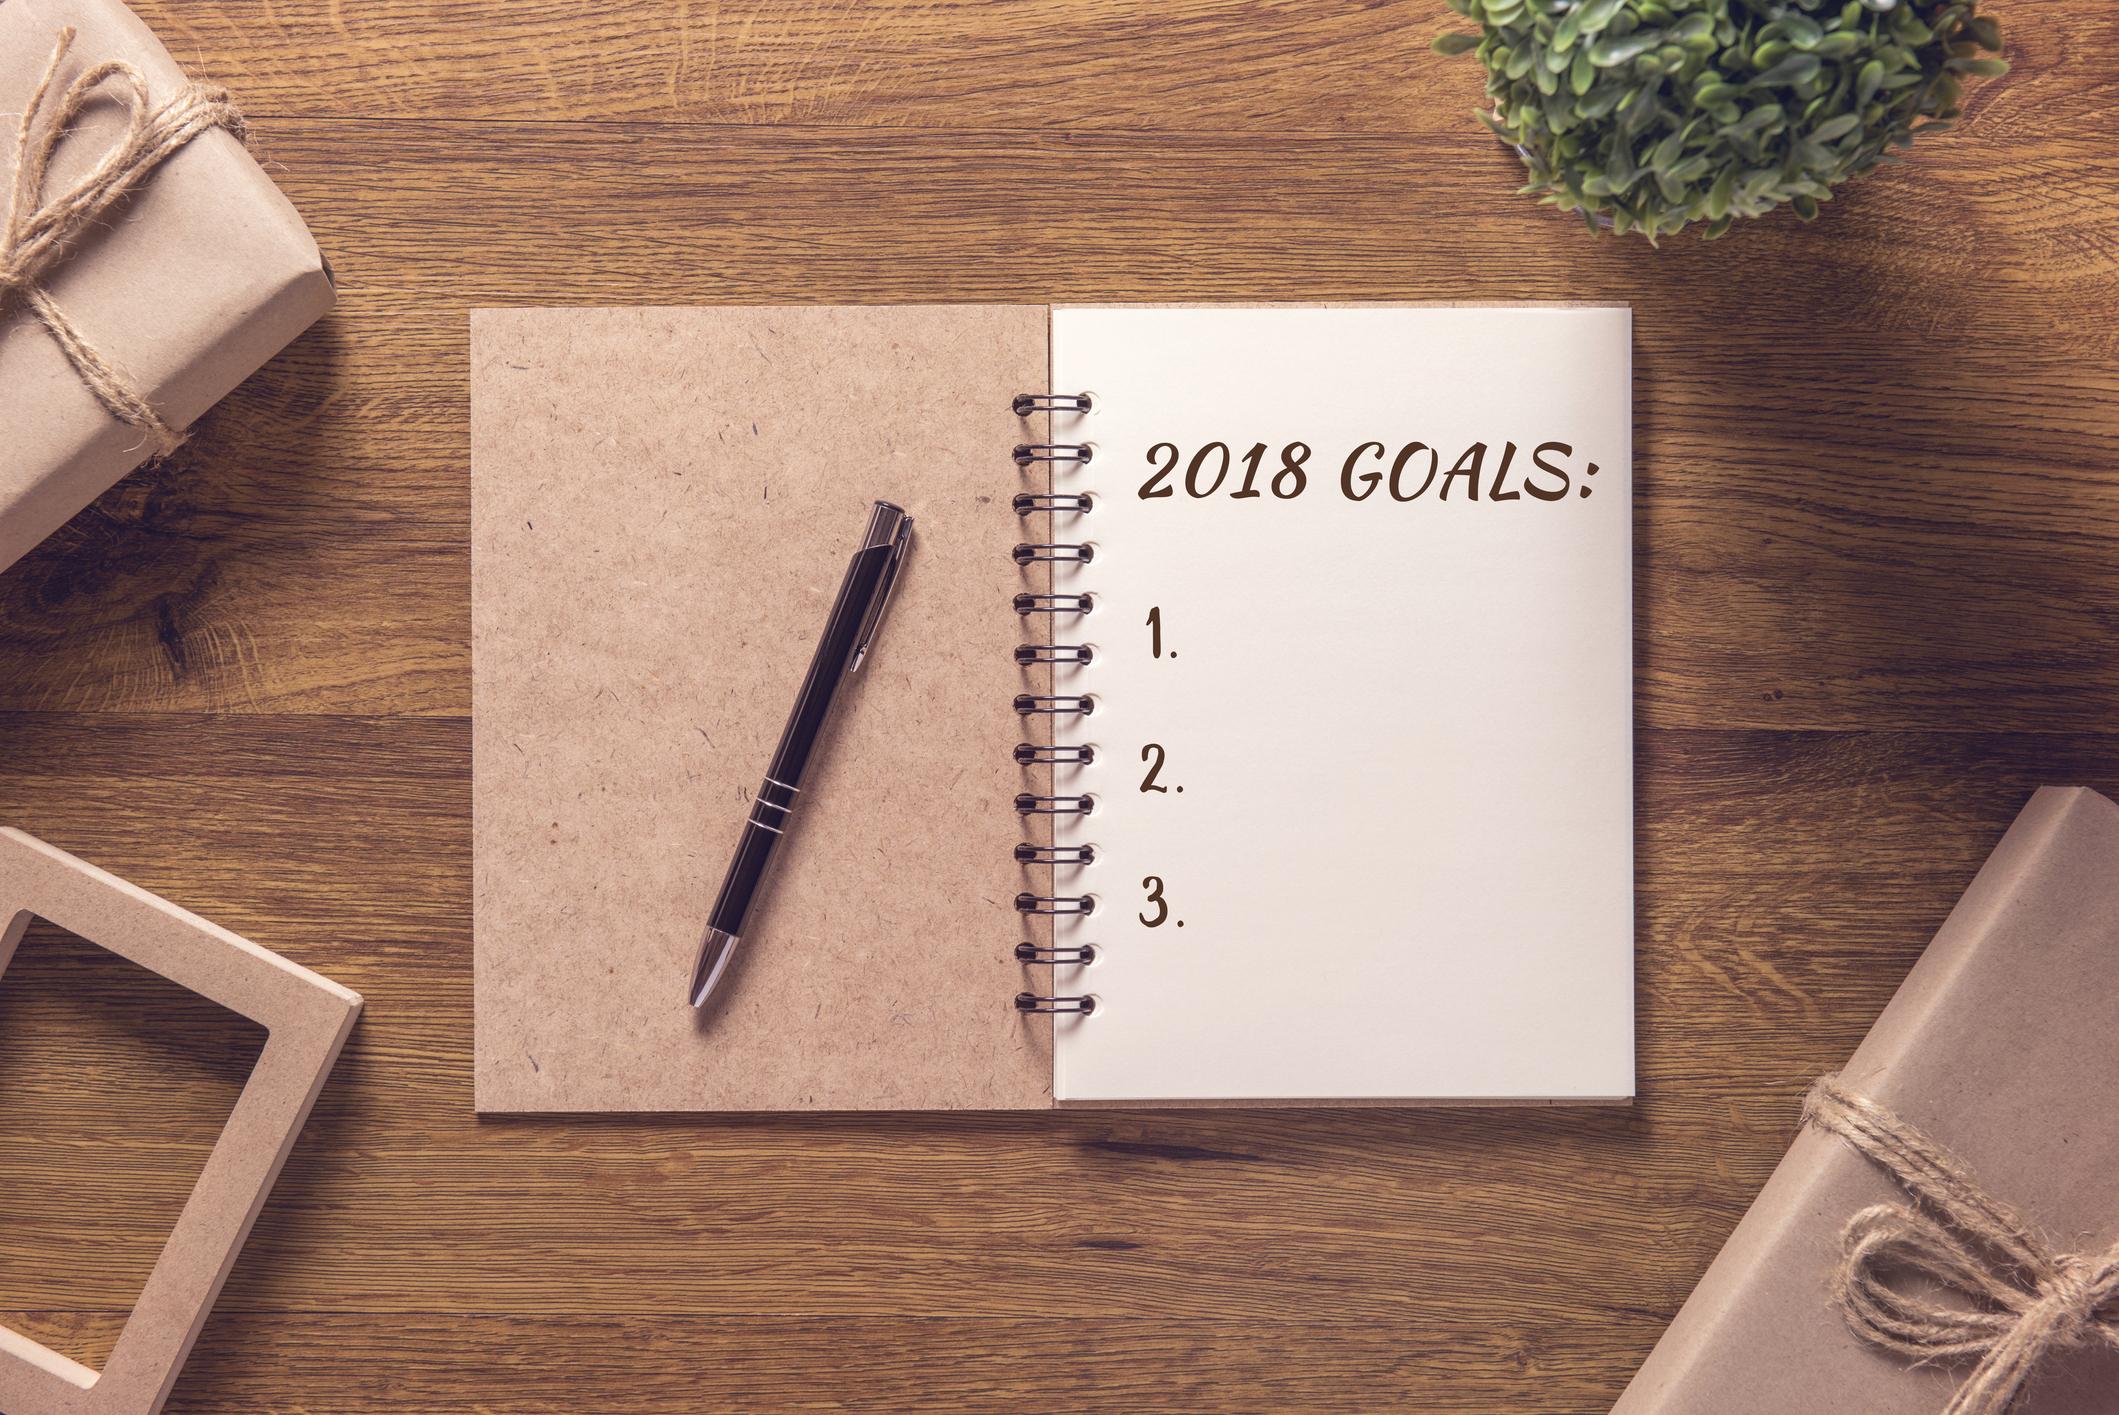 Notebook with 2018 goals written on a sheet of paper